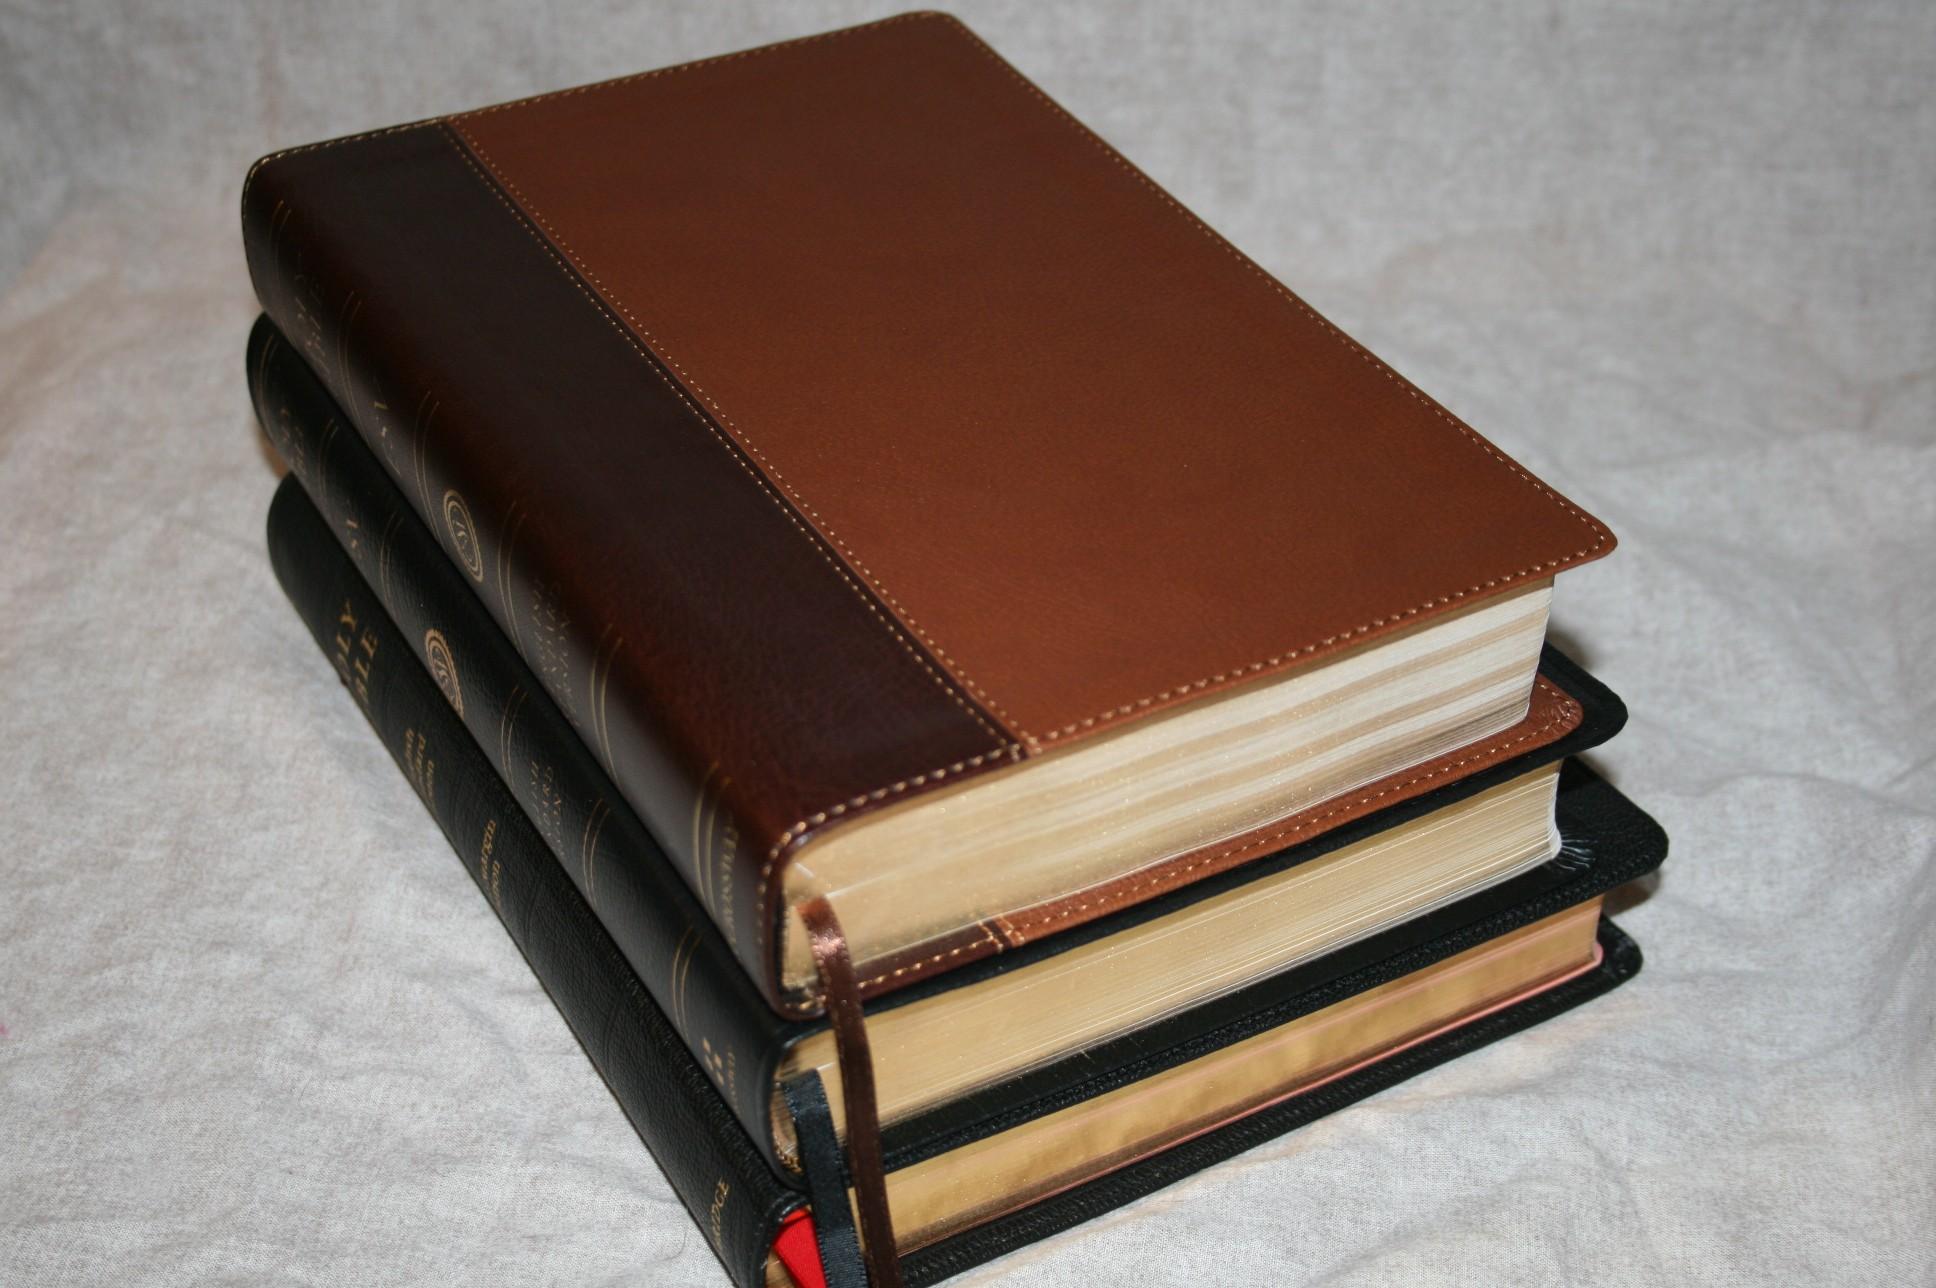 Cambridge And Crossway Esv Wide Margin Bible Comparisons